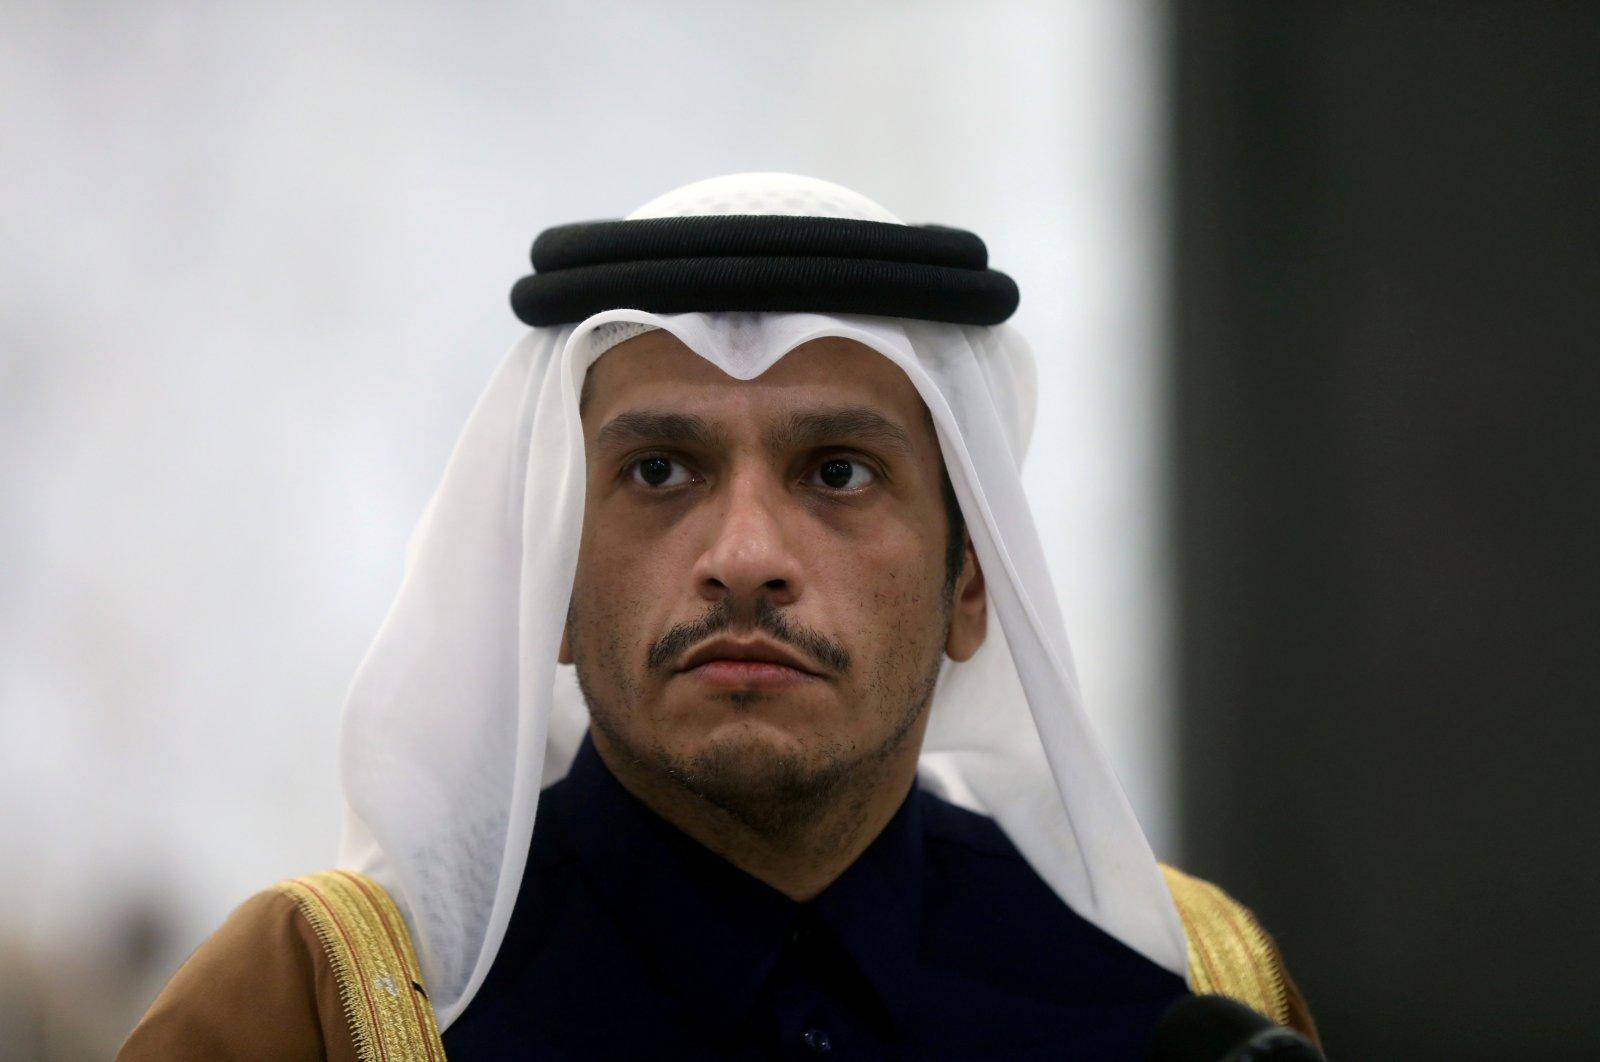 Qatari foreign minister Sheikh Mohammed bin Abdulrahman Al Thani is pictured at the presidential palace in Baabda, Lebanon, Feb. 9, 2021. (Reuters Photo)